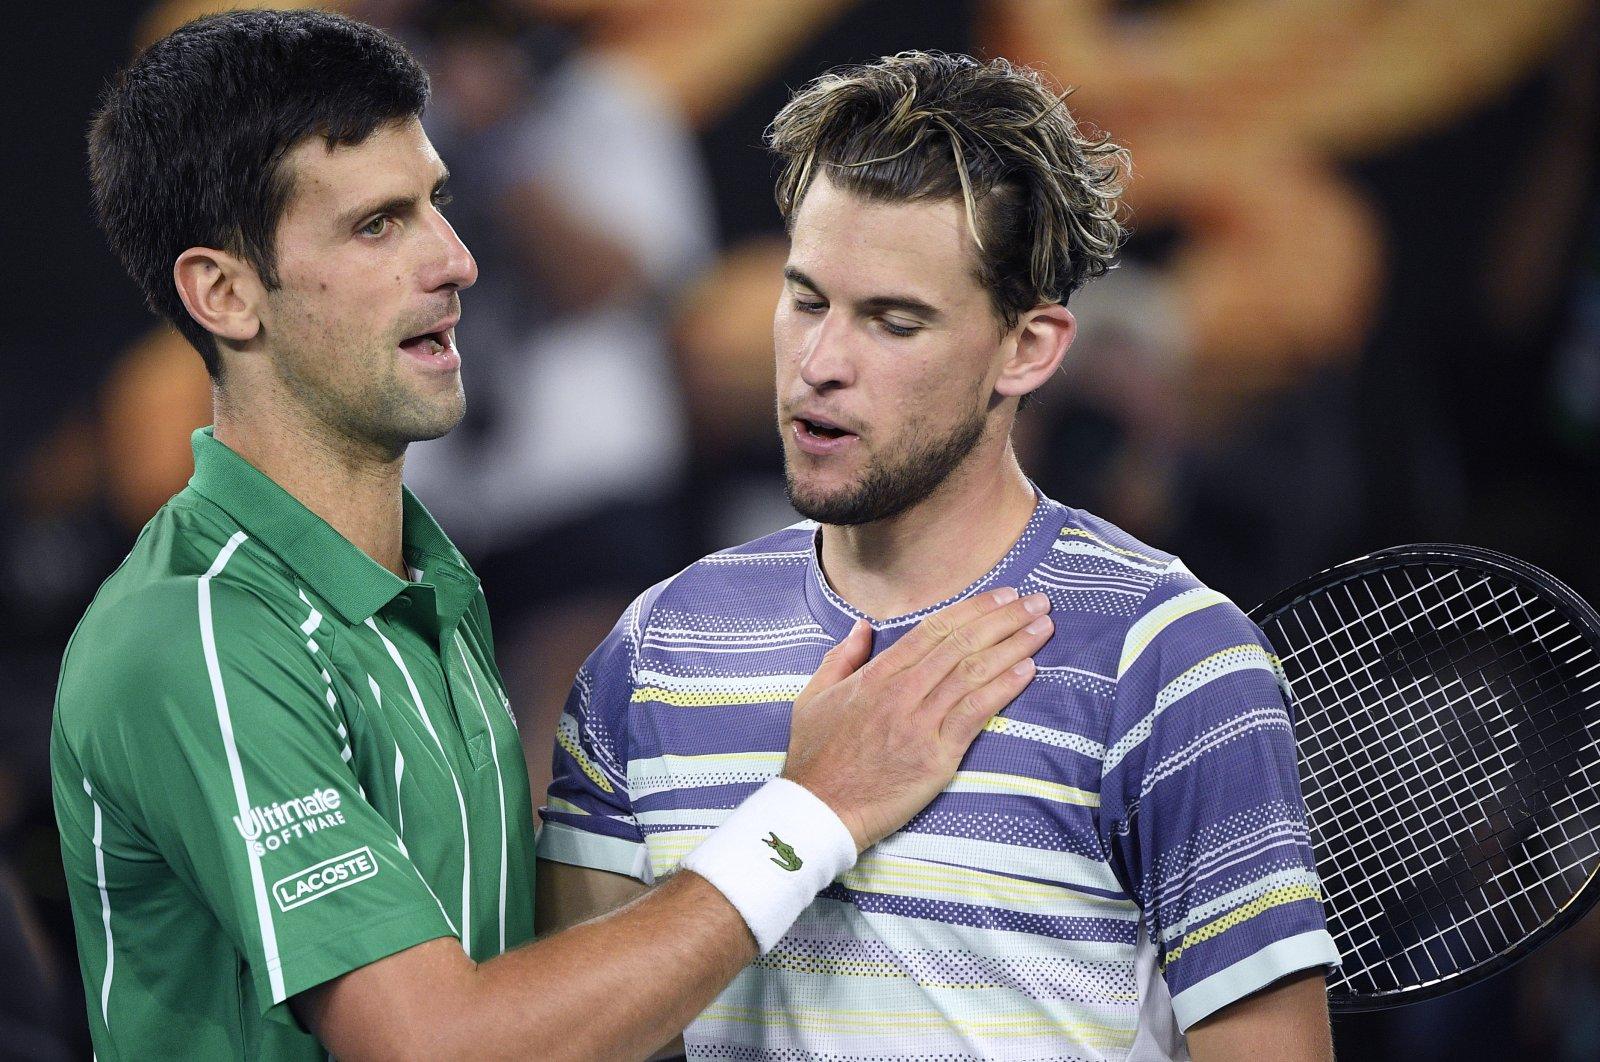 Novak Djokovic (L) congratulated by Dominic Thiem after winning the Australian Open tennis championship in Melbourne, Australia, Feb. 2, 2020. (AP Photo)